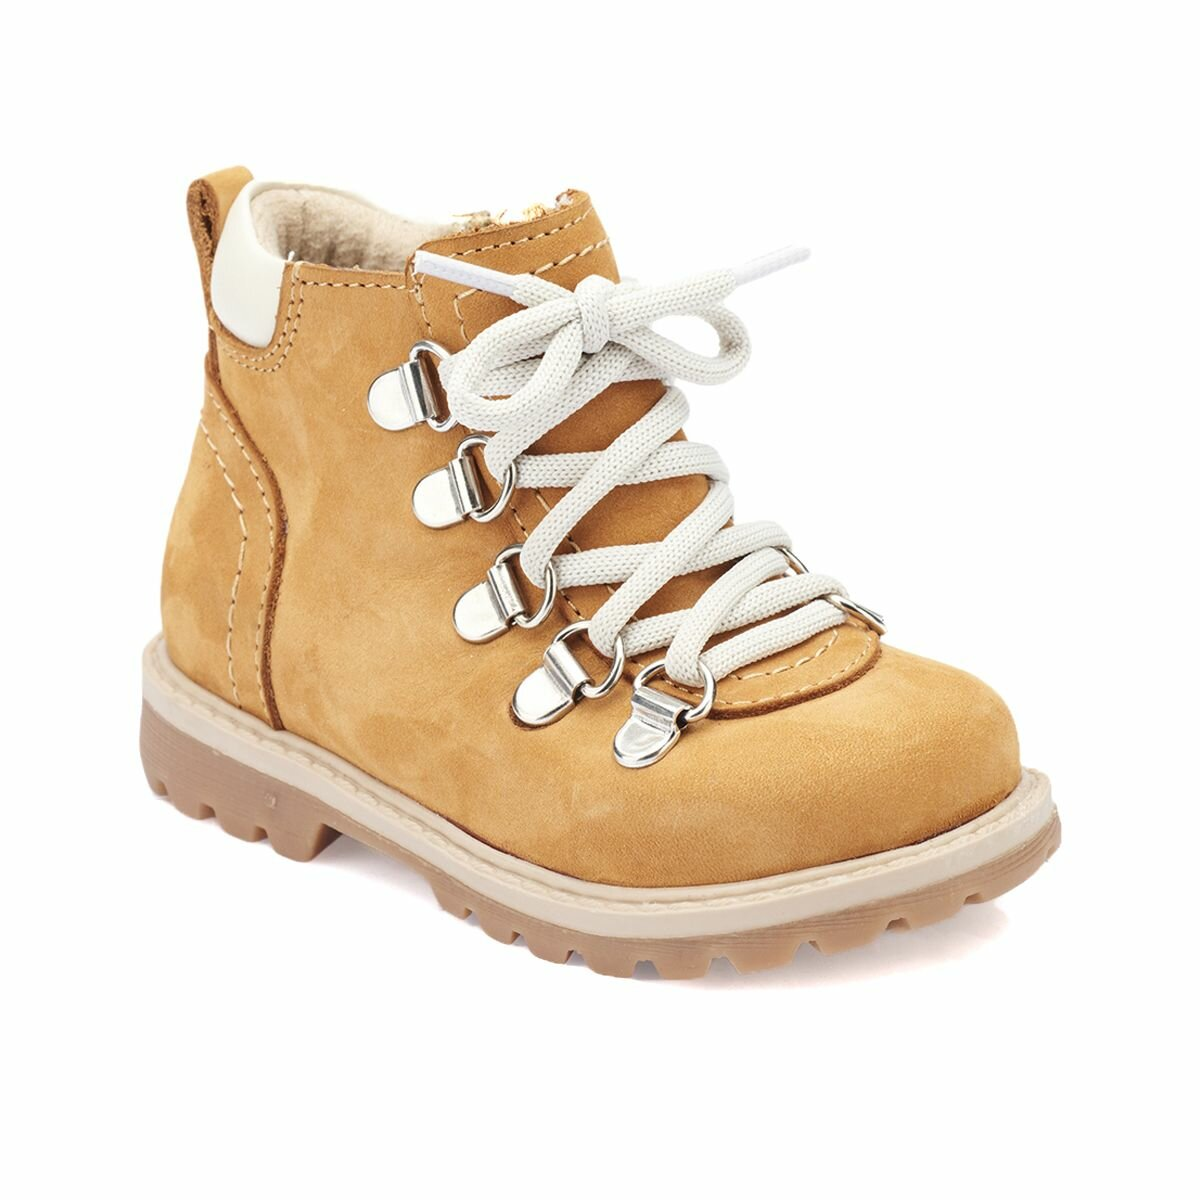 FLO 82.509544.I Yellow Male Child Boots Polaris